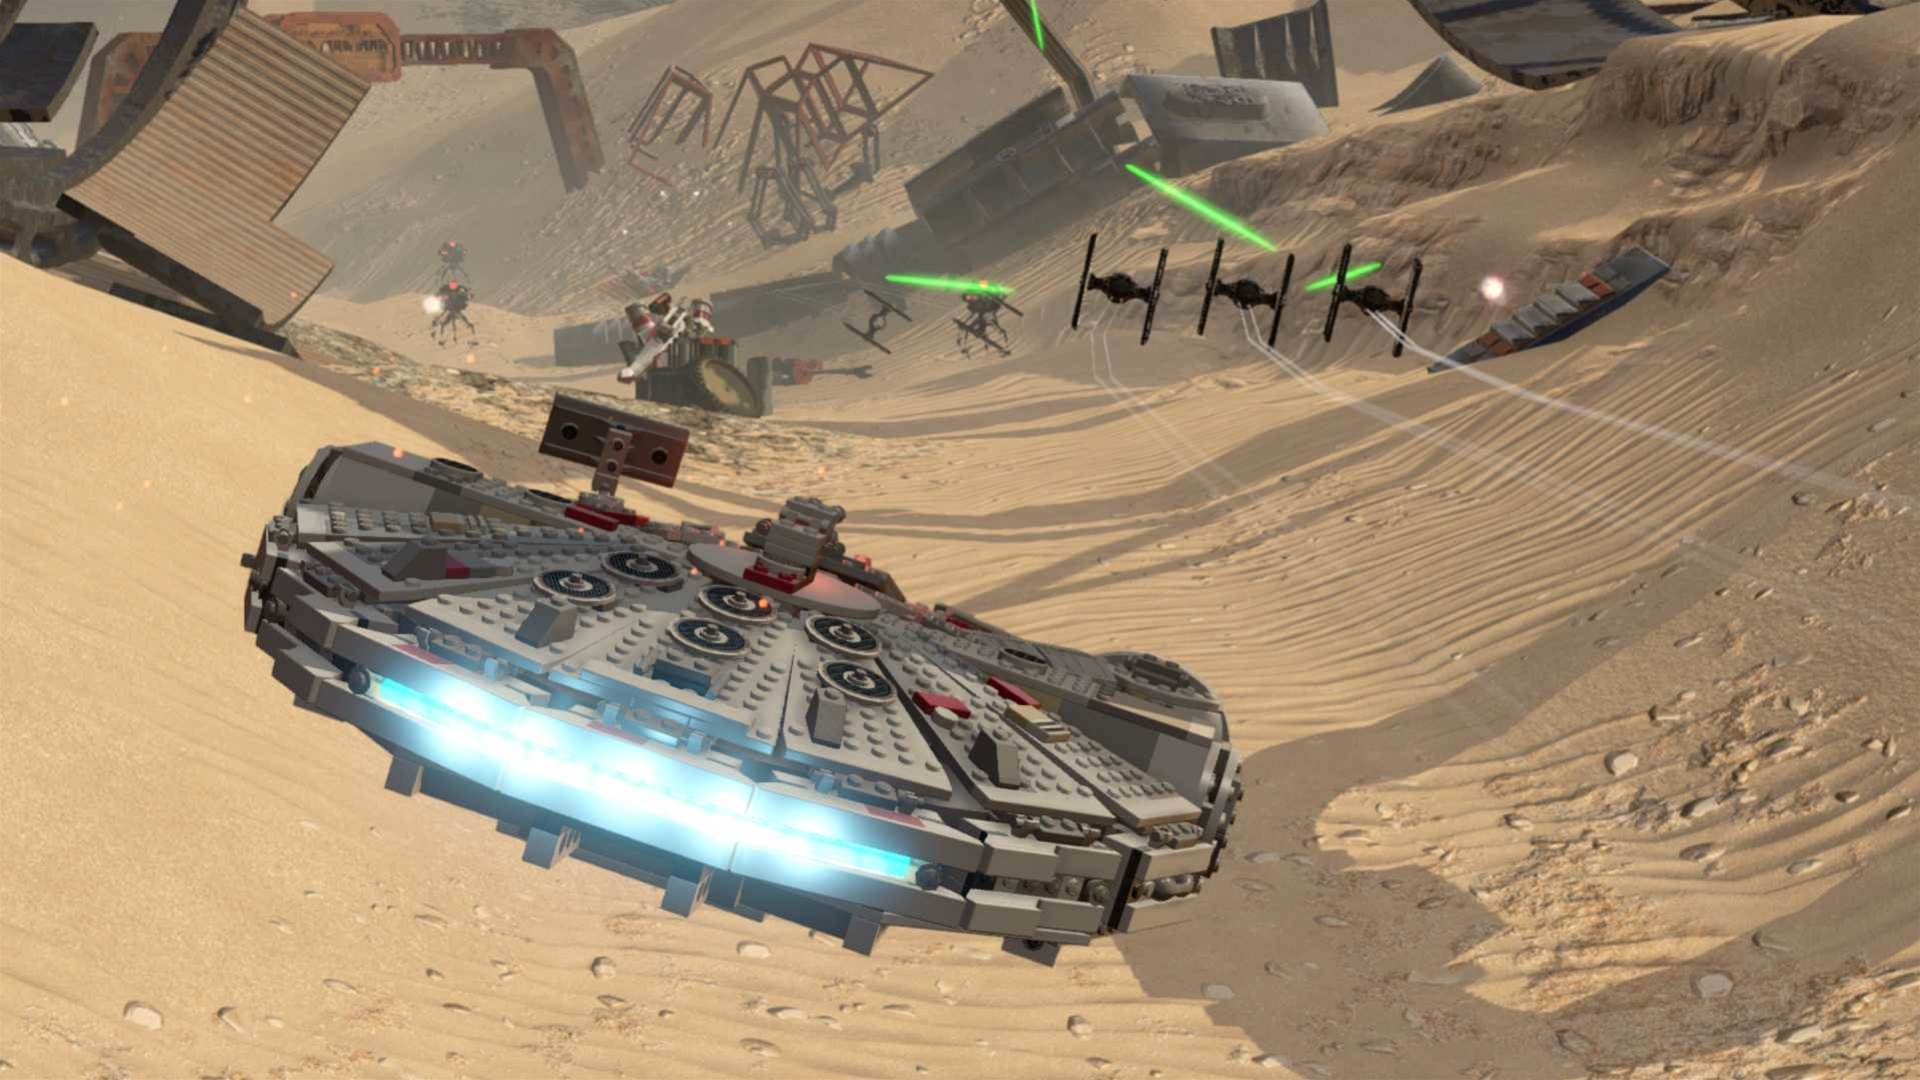 E3 2016 - Lego Star Wars: The Force Awakens screenshots